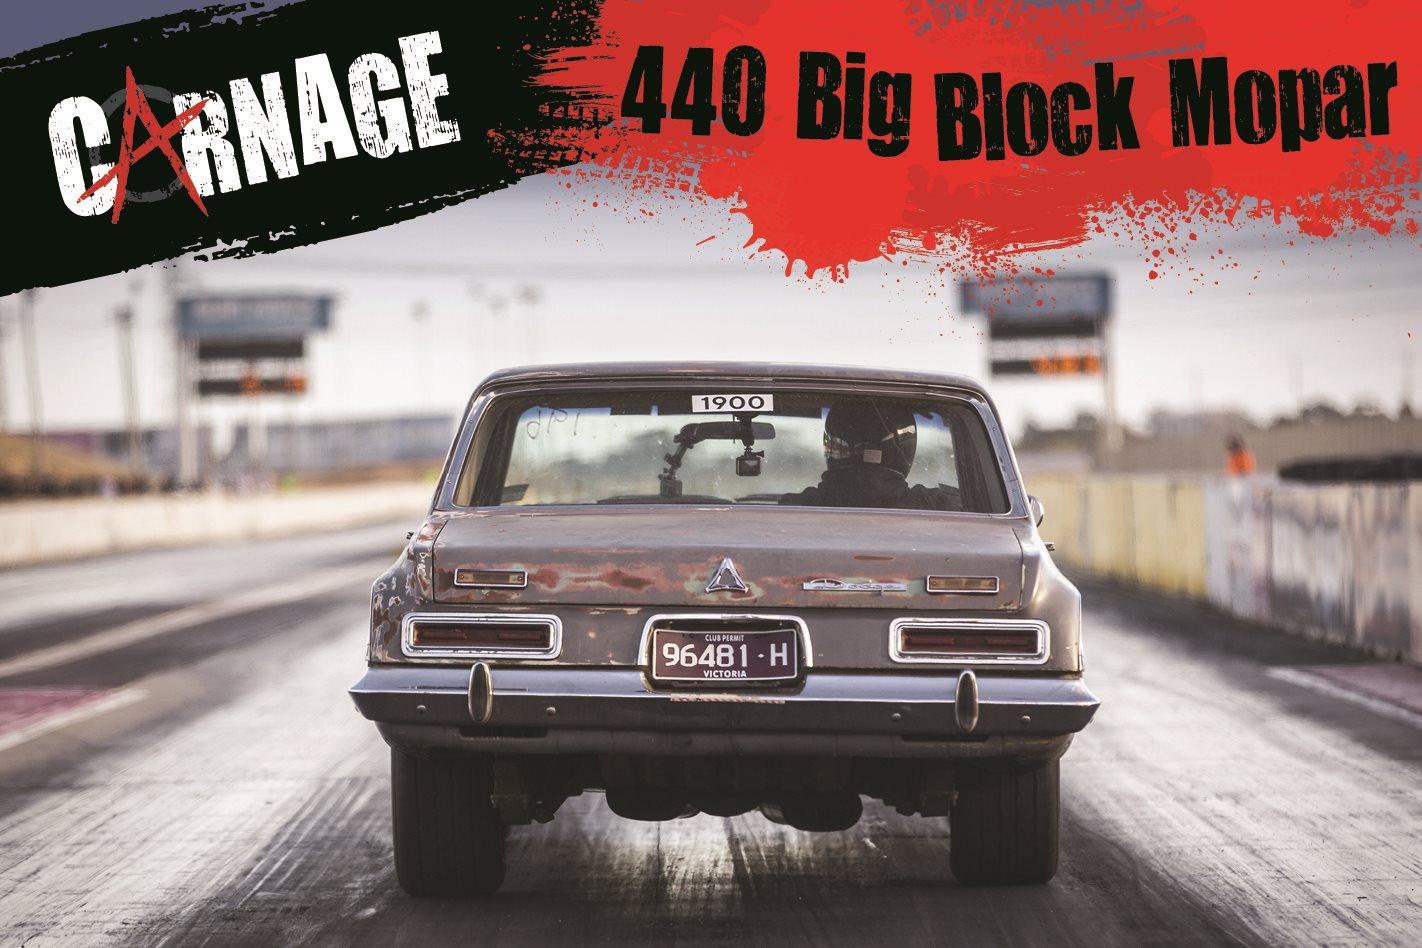 Mr Dodgey 440-powered 1963 Dodge Phoenix Part Five – Carnage